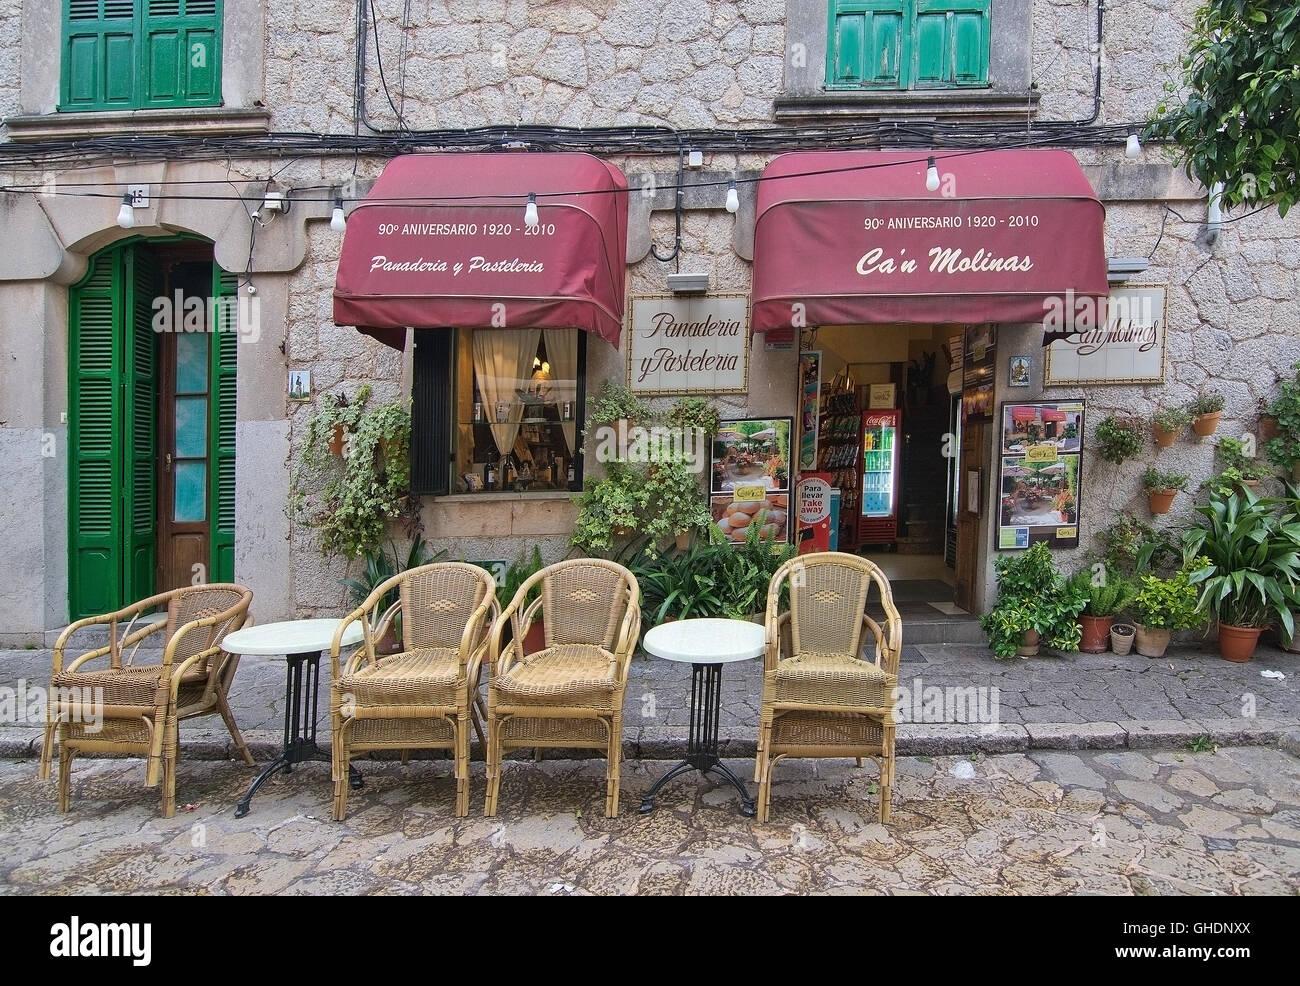 Can Molinas cafe entrance in Valldemossa, Mallorca, Balearic islands, Spain on April 30, 2016. Stock Photo